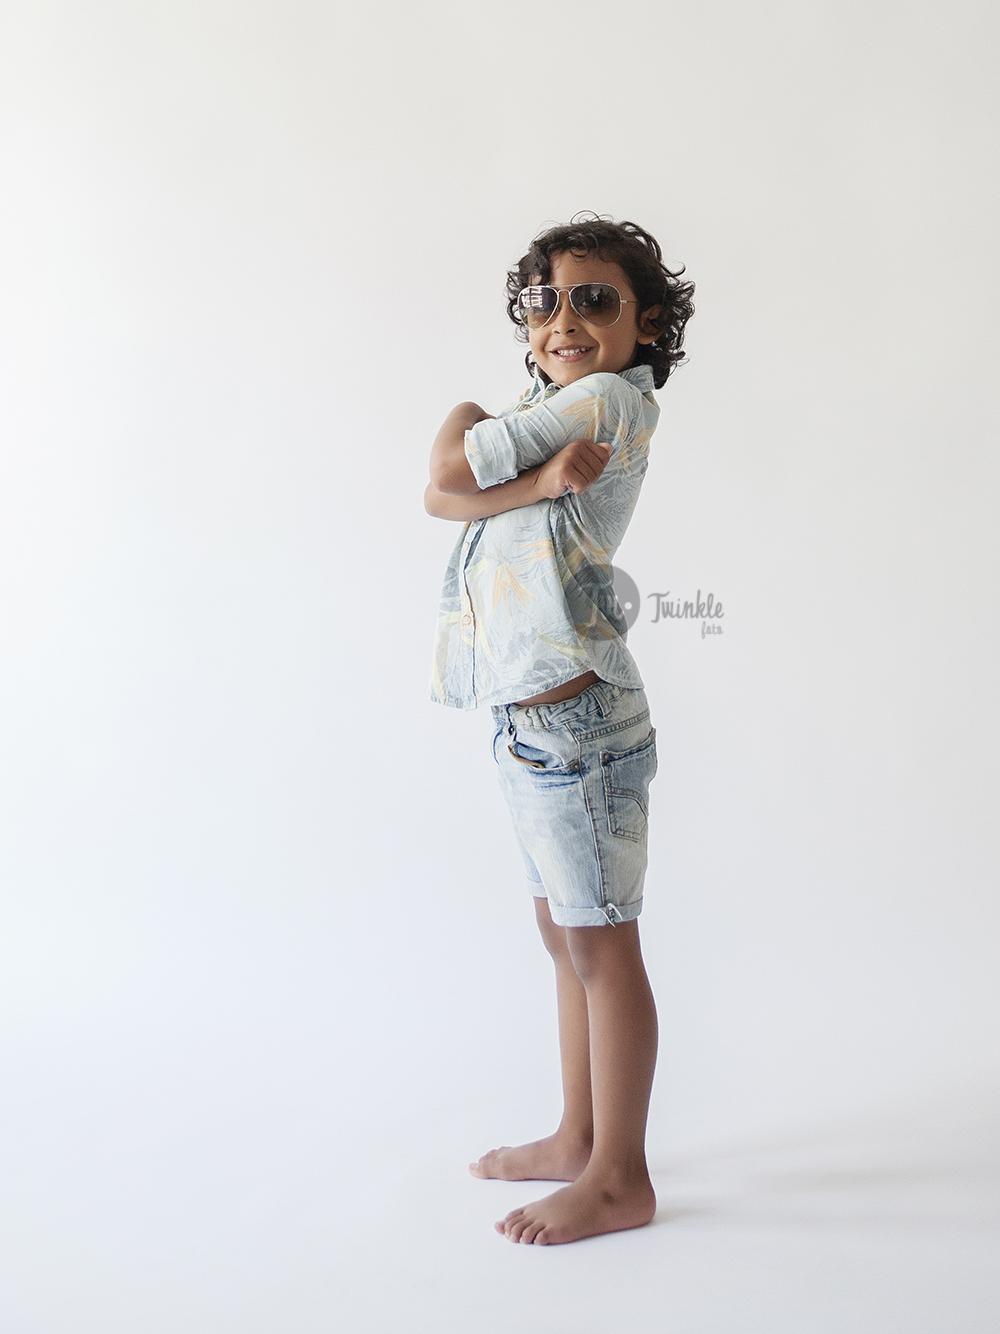 fotos_book_niño_ismael_09